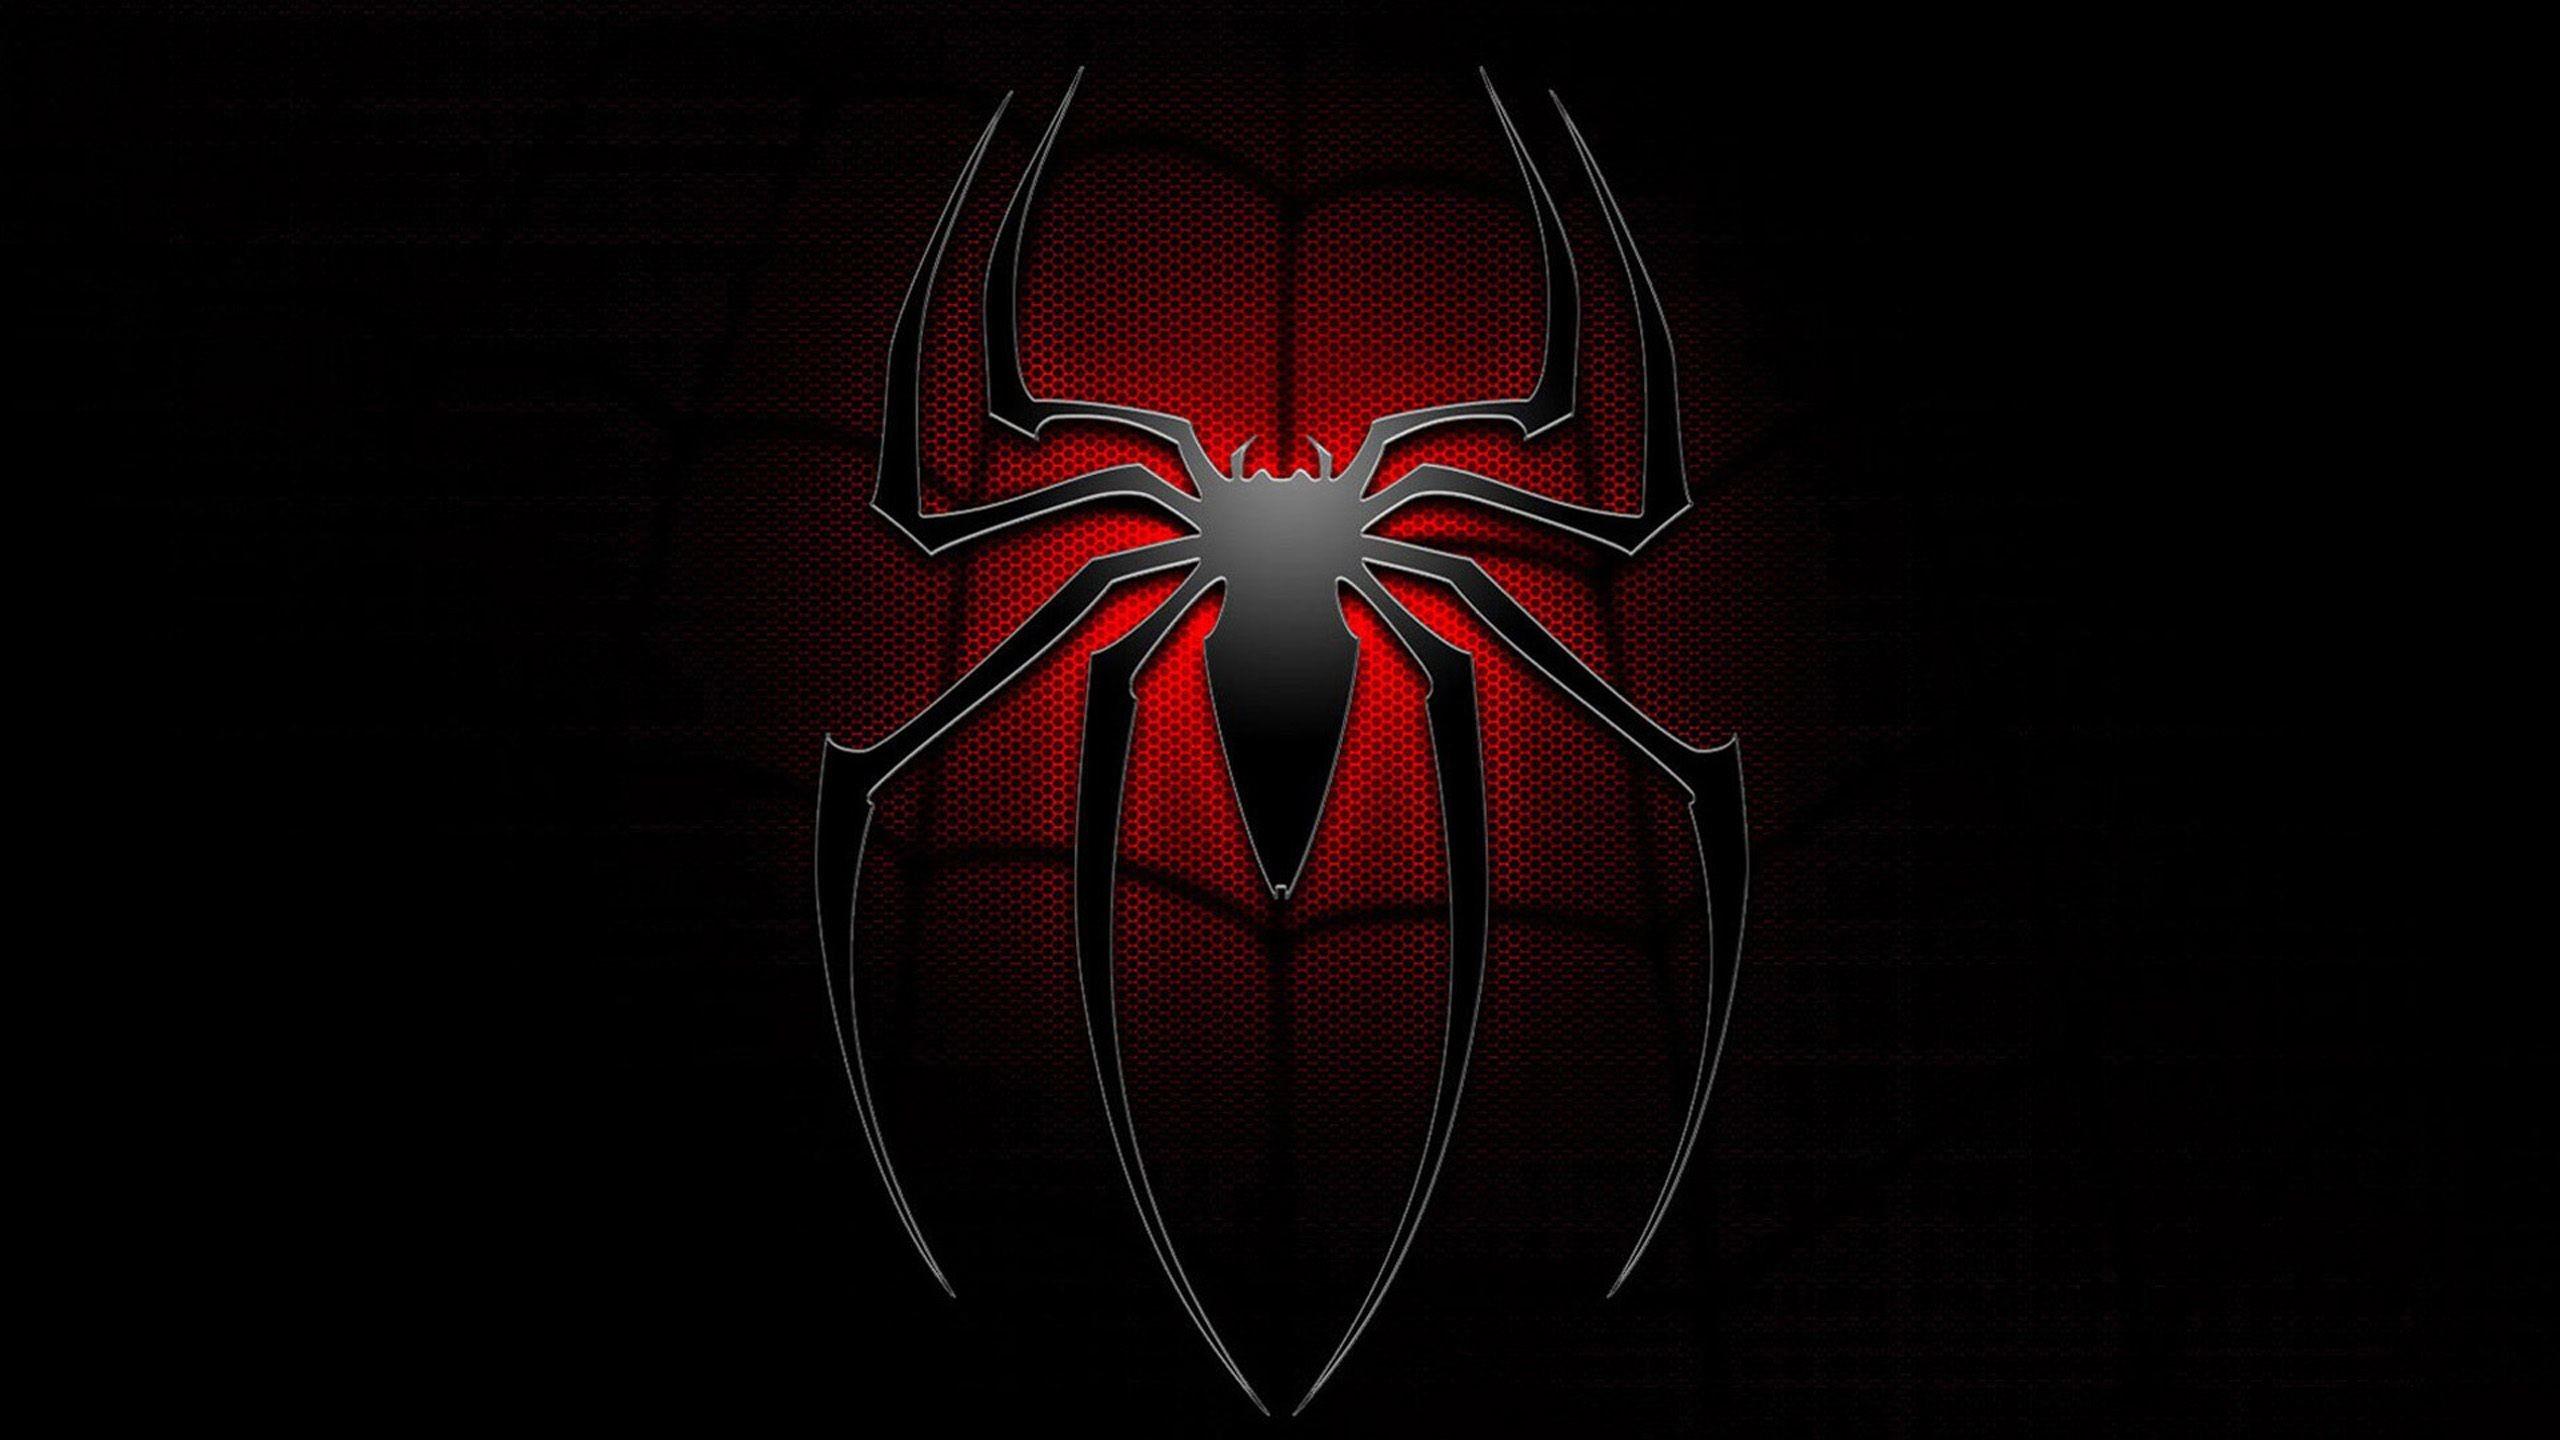 Spiderman Neon Red Wallpaper ·① WallpaperTag